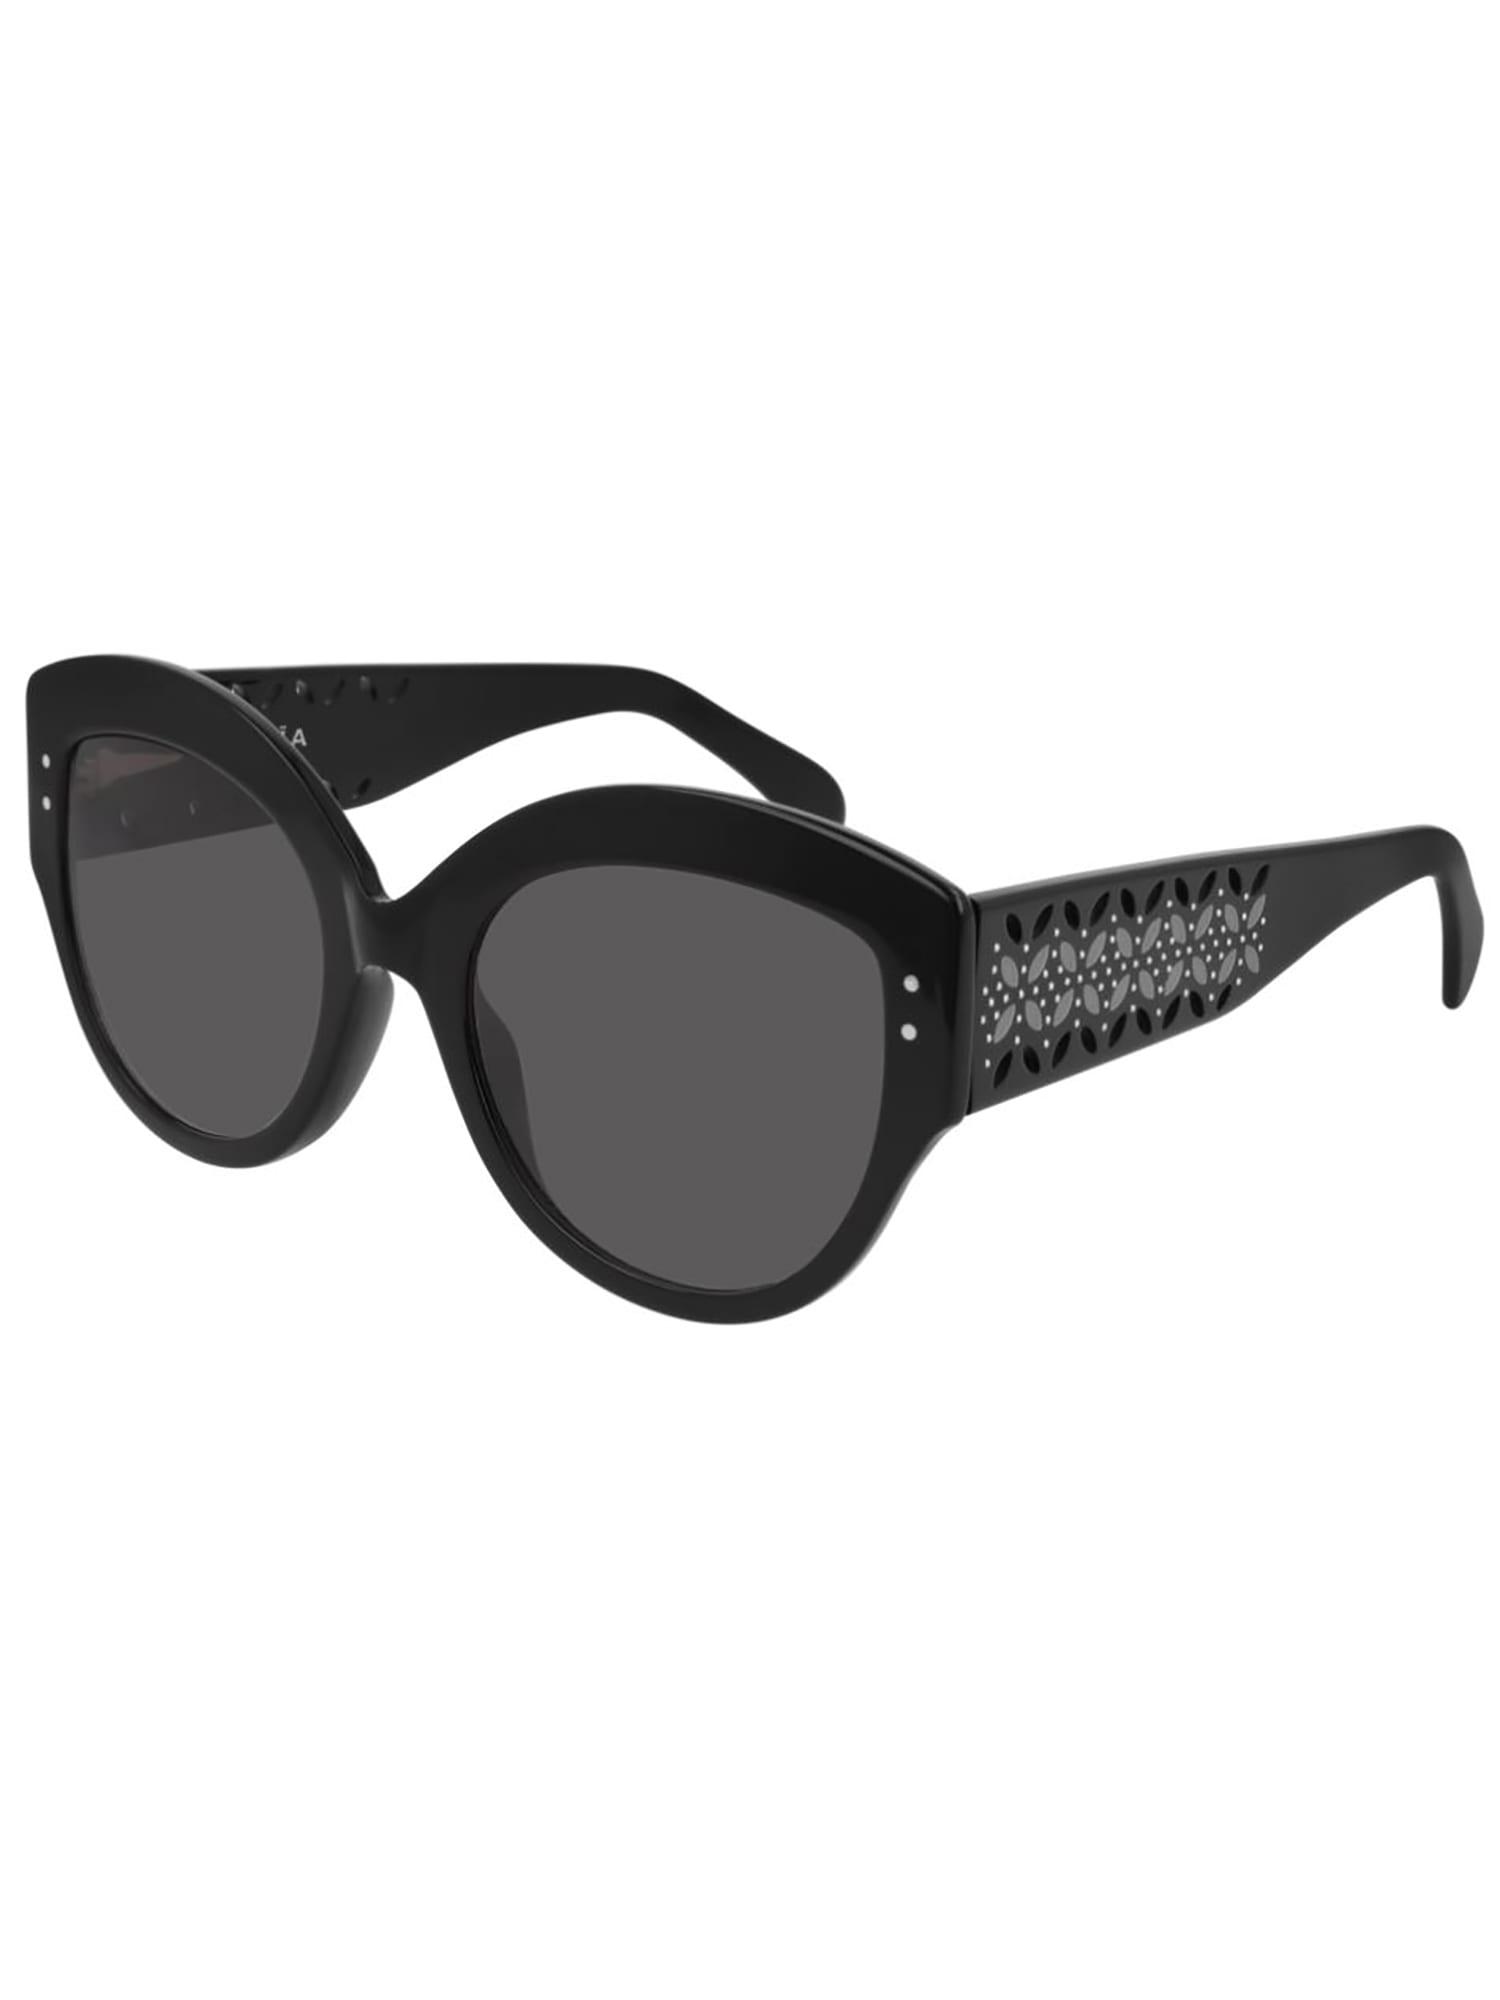 Alaïa Round Acetate Sunglasses W/ Perforated Arms In Black